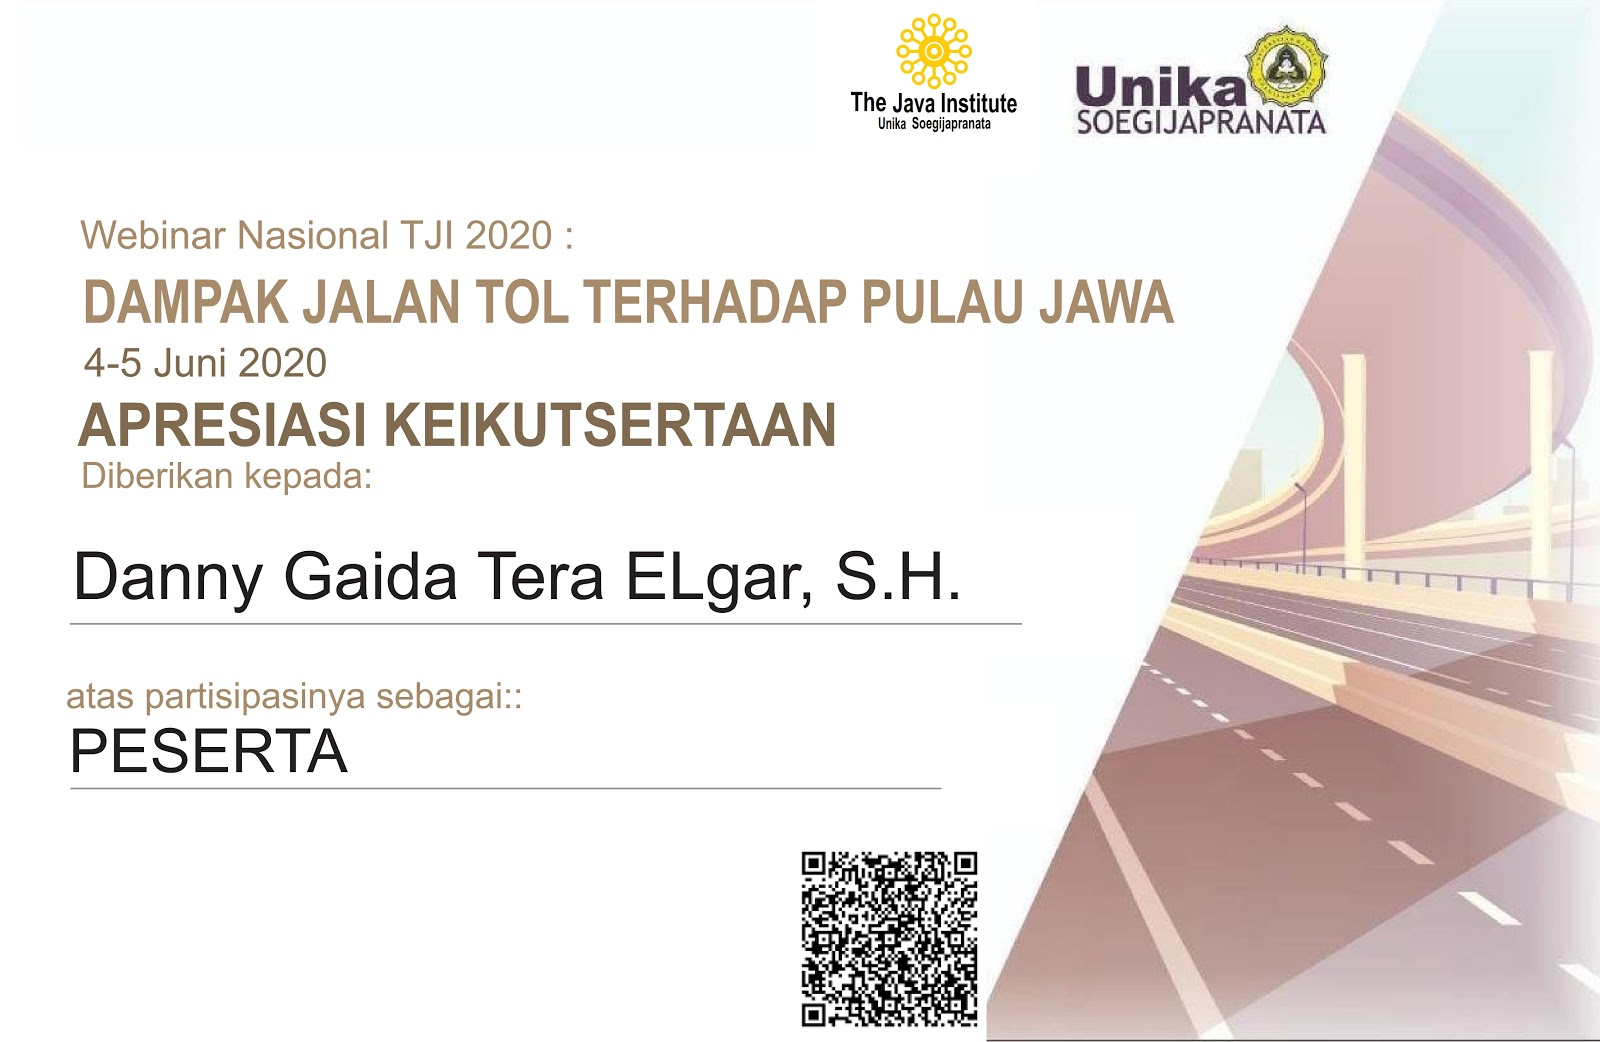 Sertifikat Penghargaan Webinar Nasional The Java Institute (TJI) Universitas Katolik (UNIKA) Soegijapranata Semarang | APRESIASI KEIKUTSERTAAN 4-5 Juni 2020 | Dampak Jalan Tol Terhadap Pulau Jawa